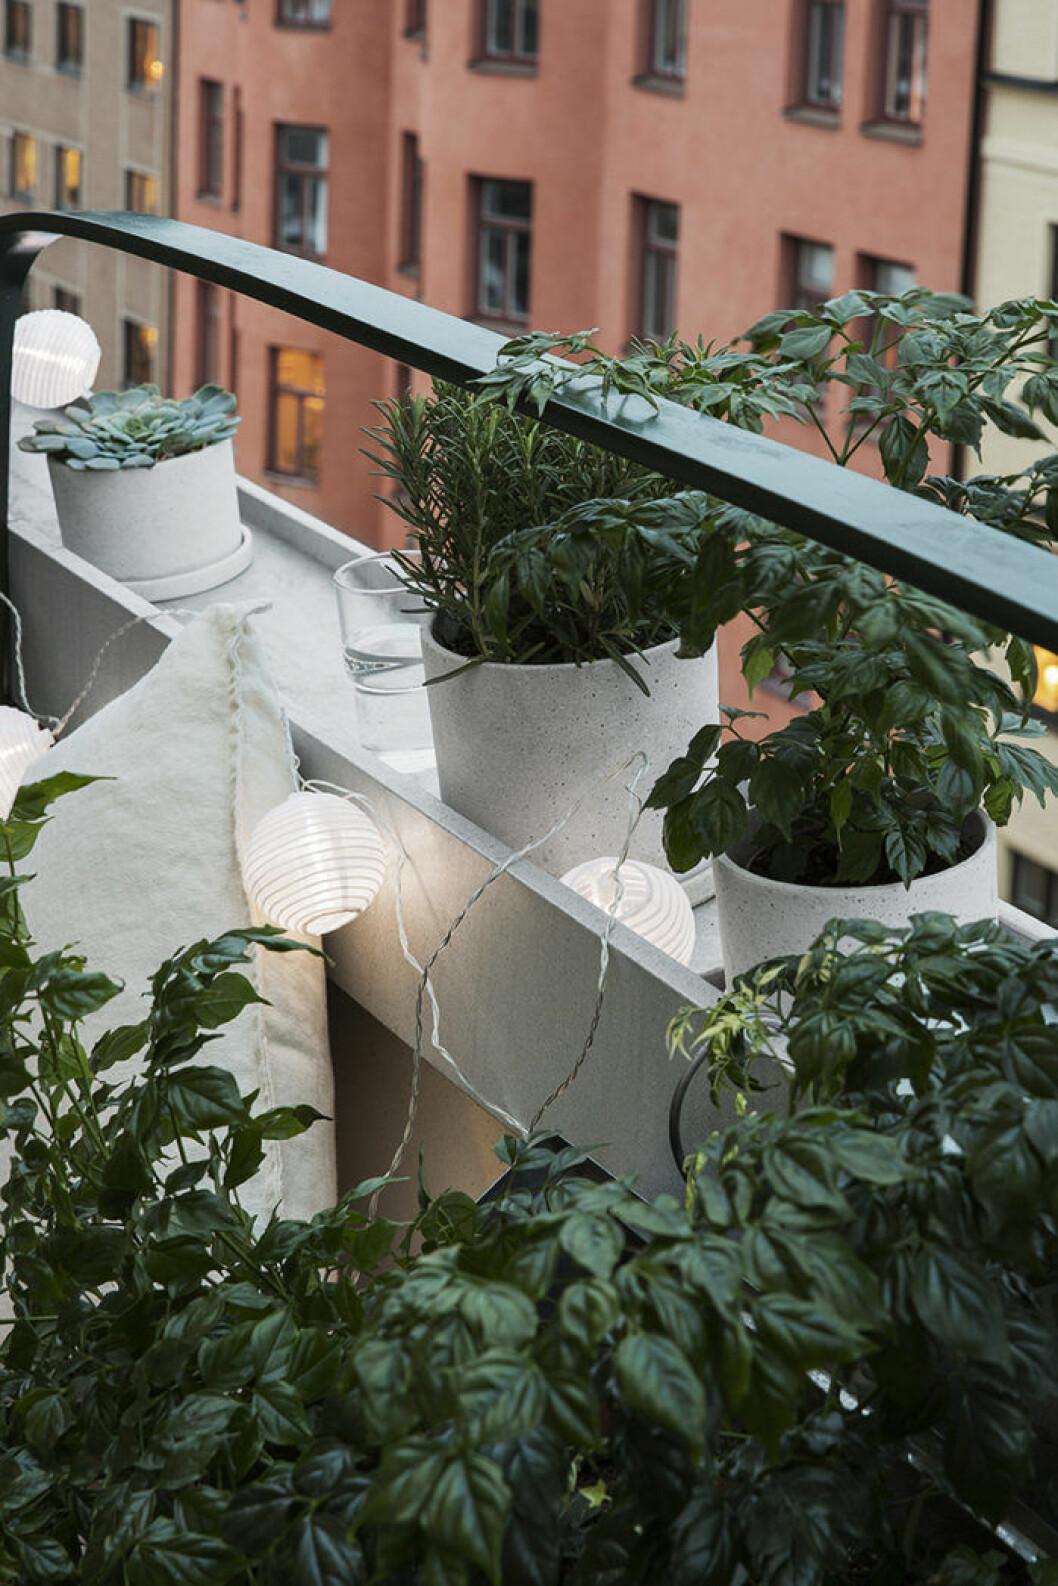 Balkongmöbler och balkongväxter, ljusslinga, Granit våren 2018.